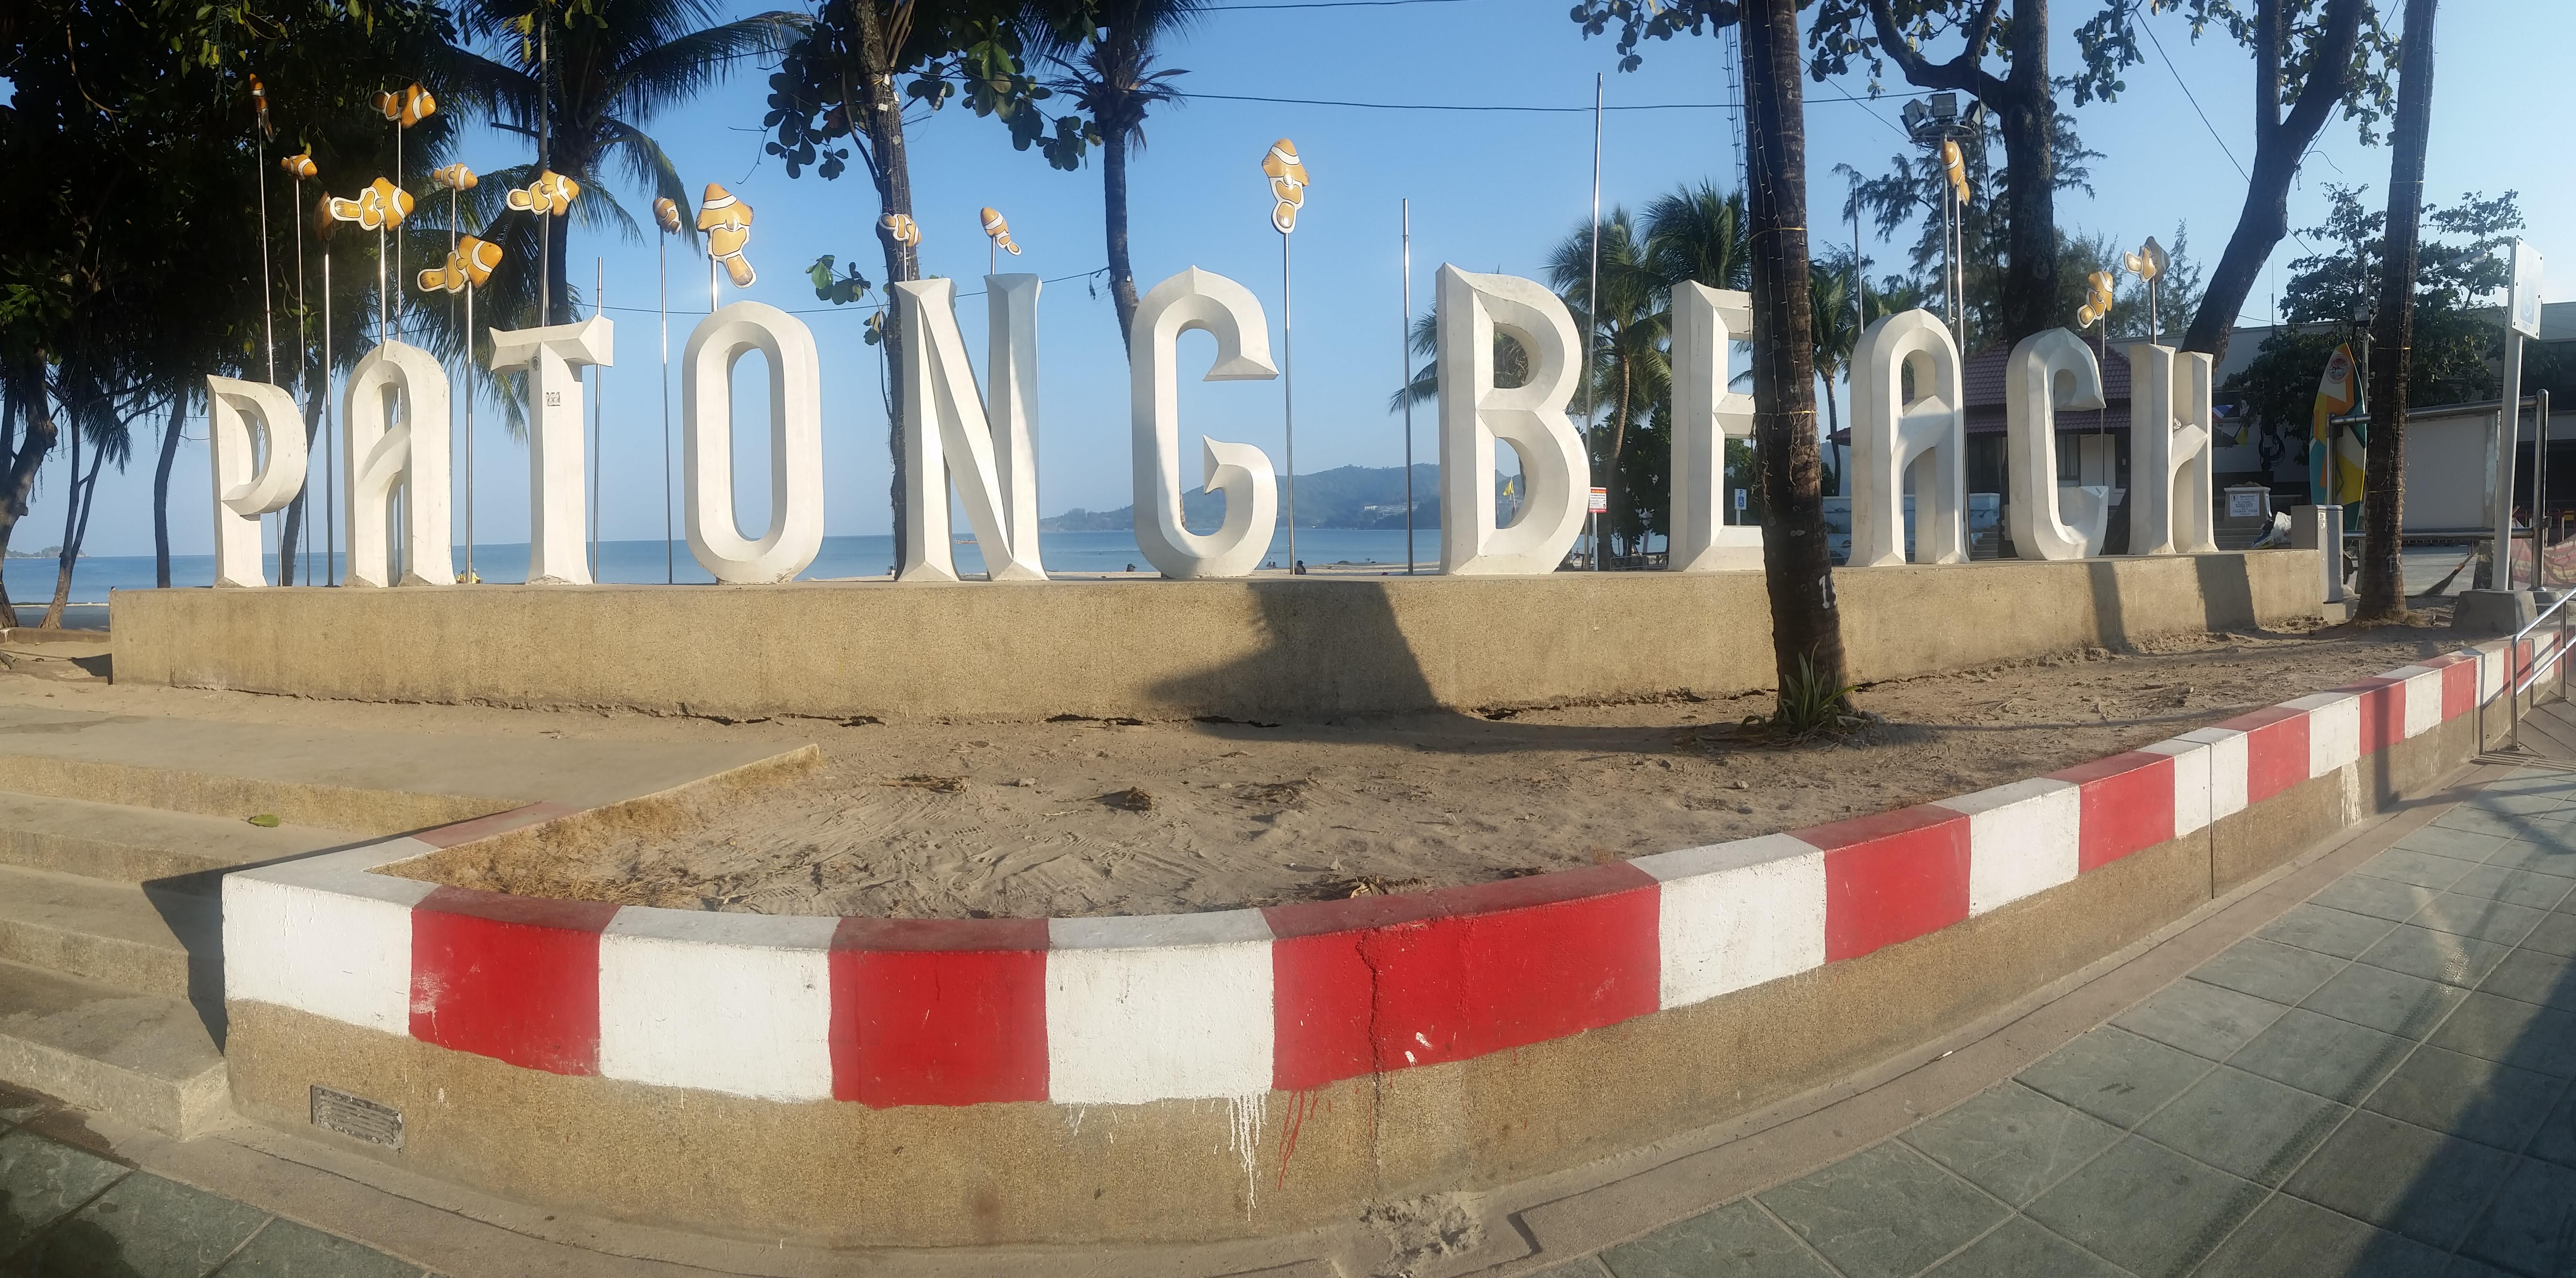 20160421 072458 - Bangala Road , Patong Beach Phuket